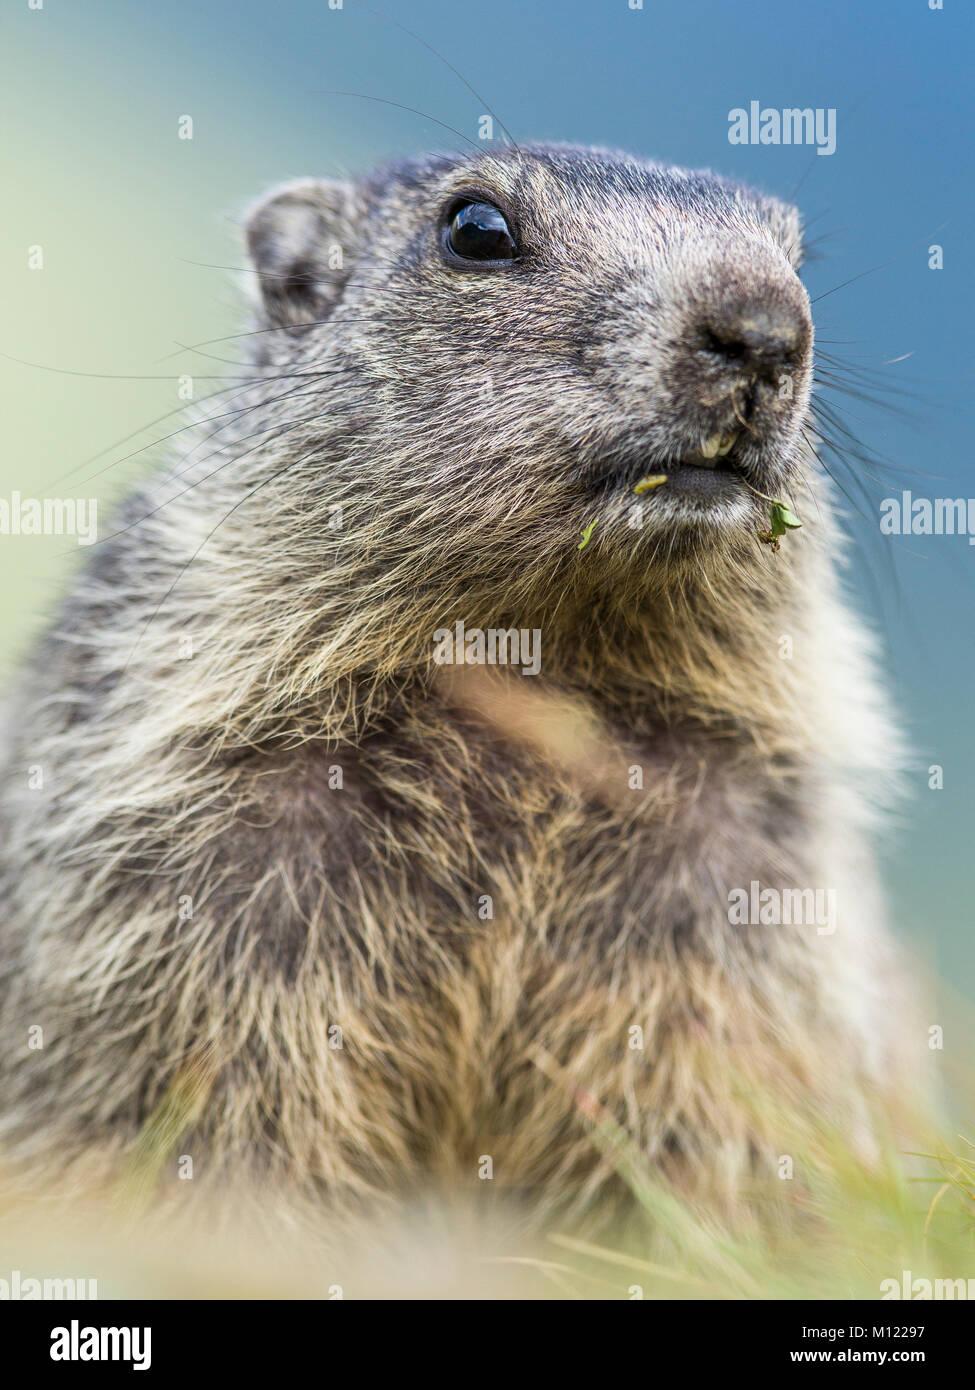 Marmot (Marmota),young animal,portrait,Großglockner,Carinthia,Austria - Stock Image